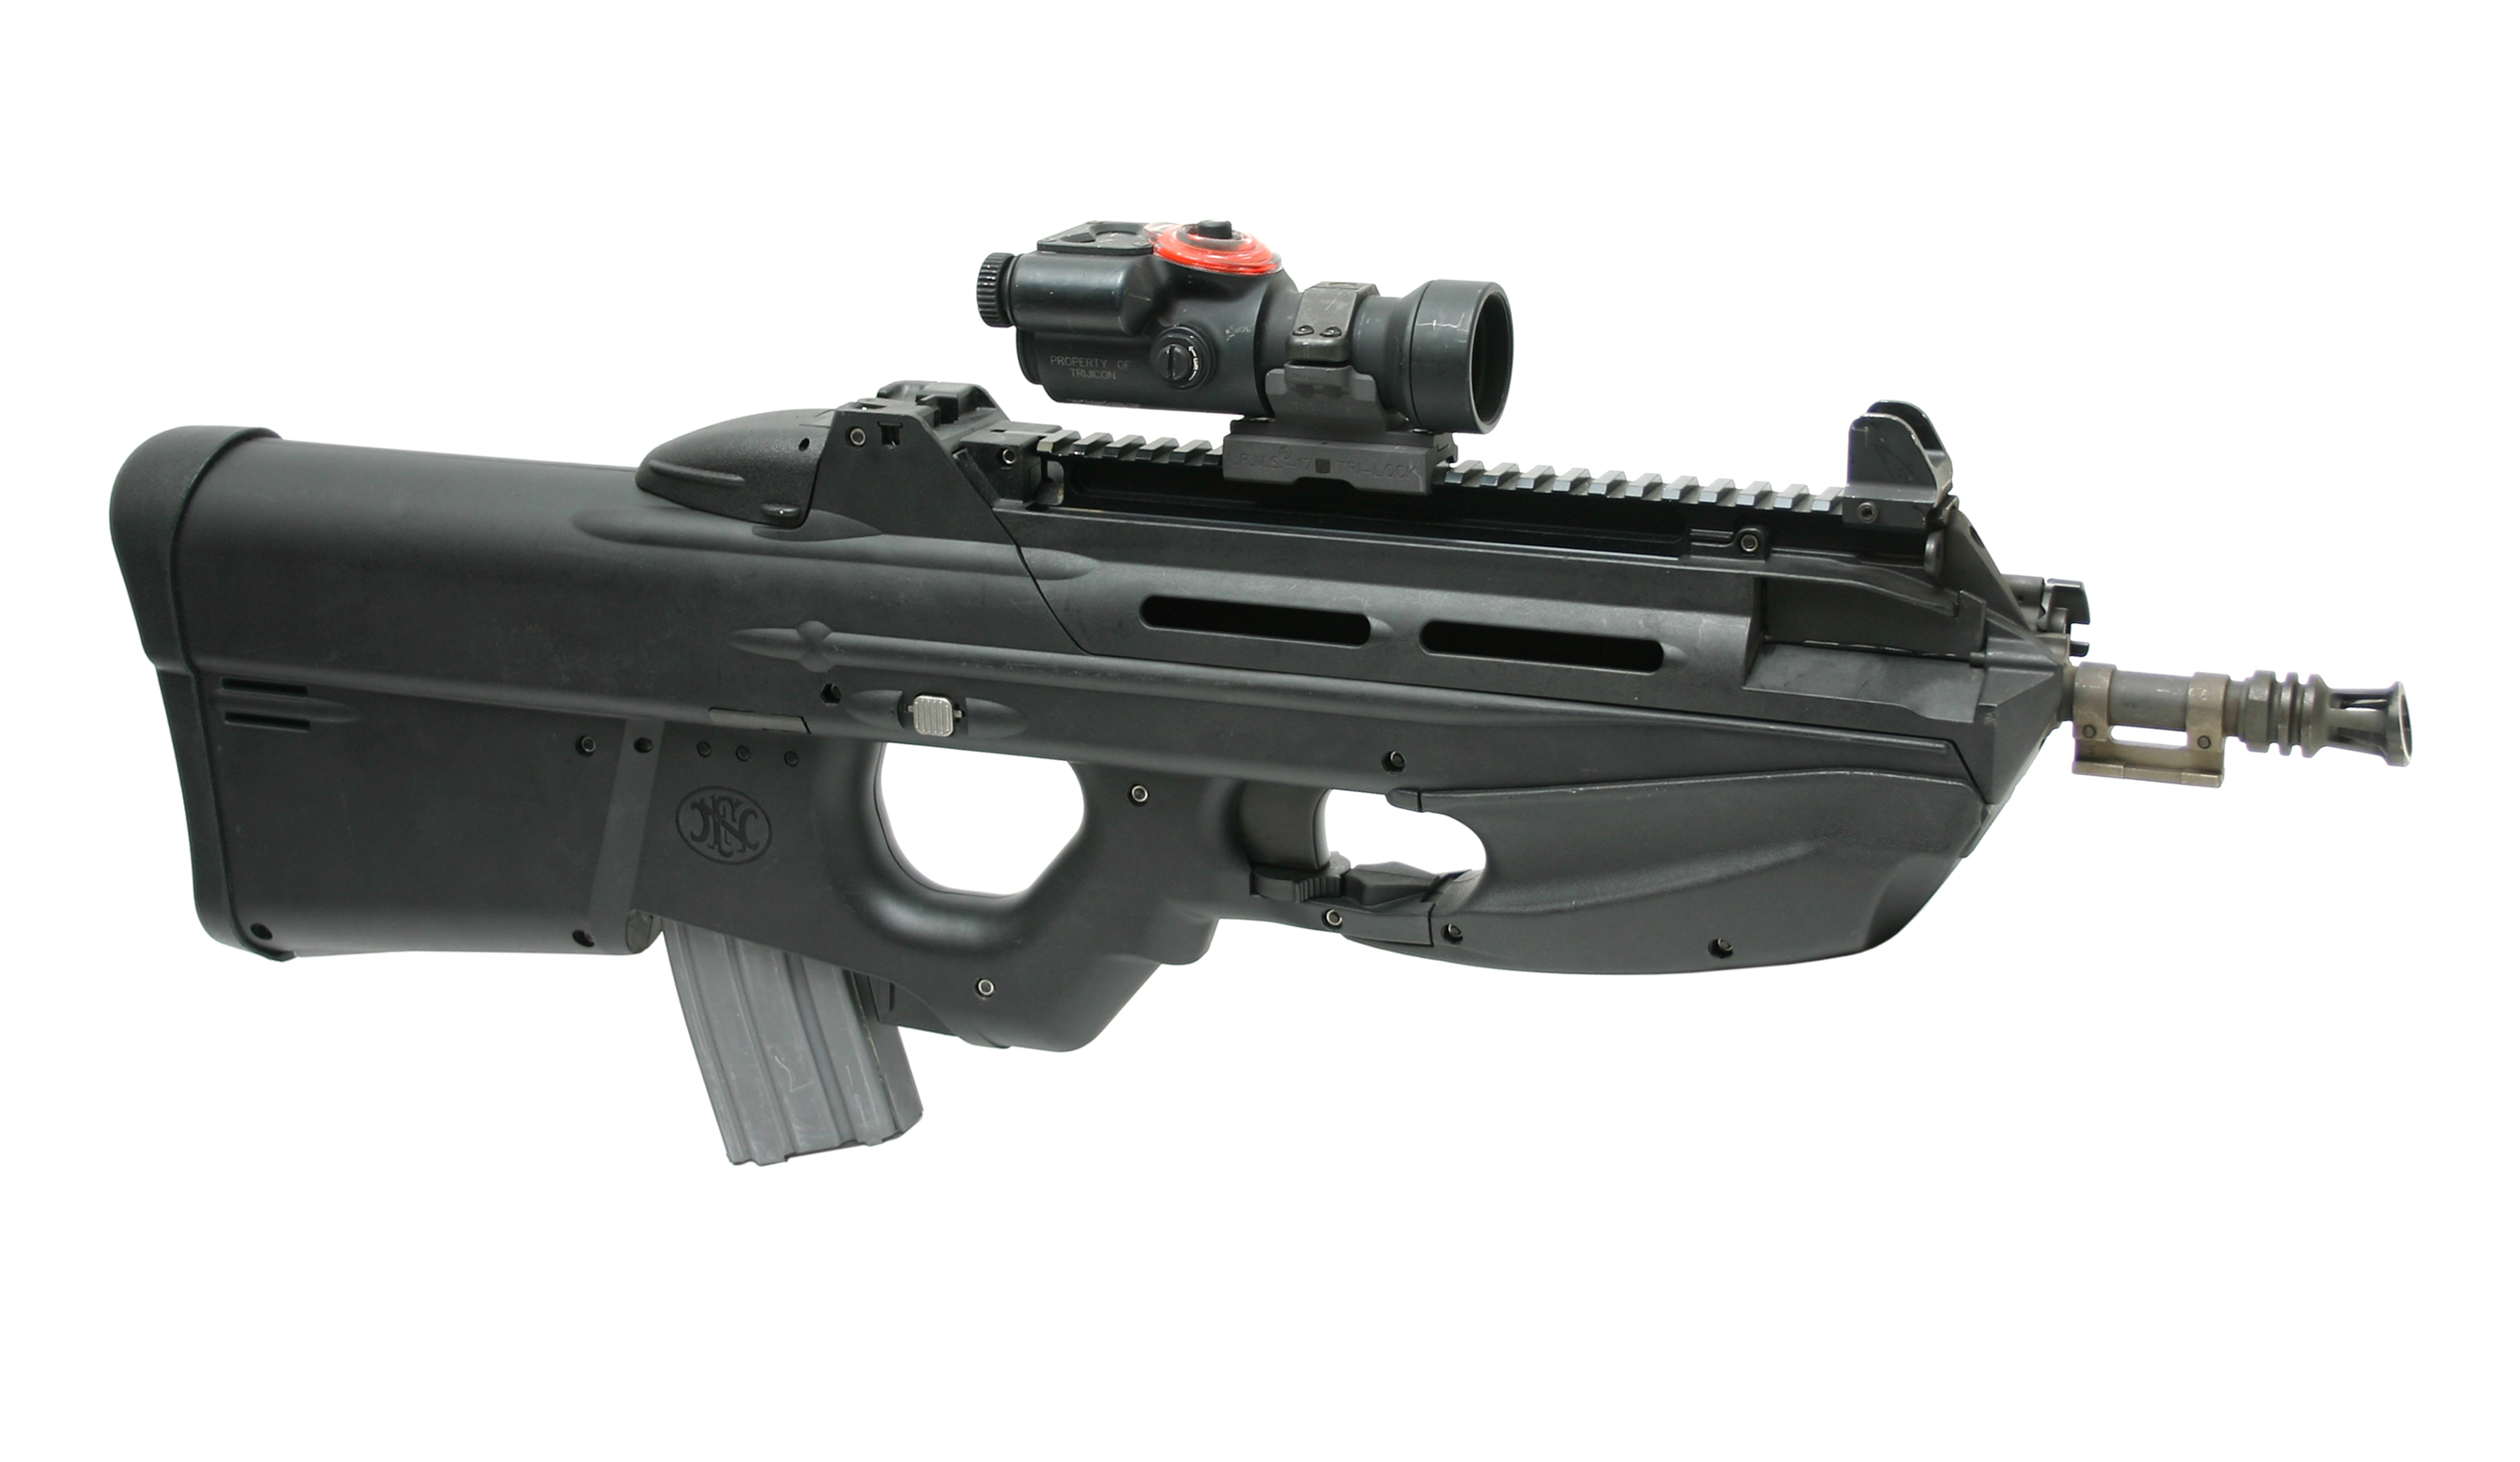 Fn F2000 Bullpup Assault Rifle HD Wallpapers | Backgrounds ...